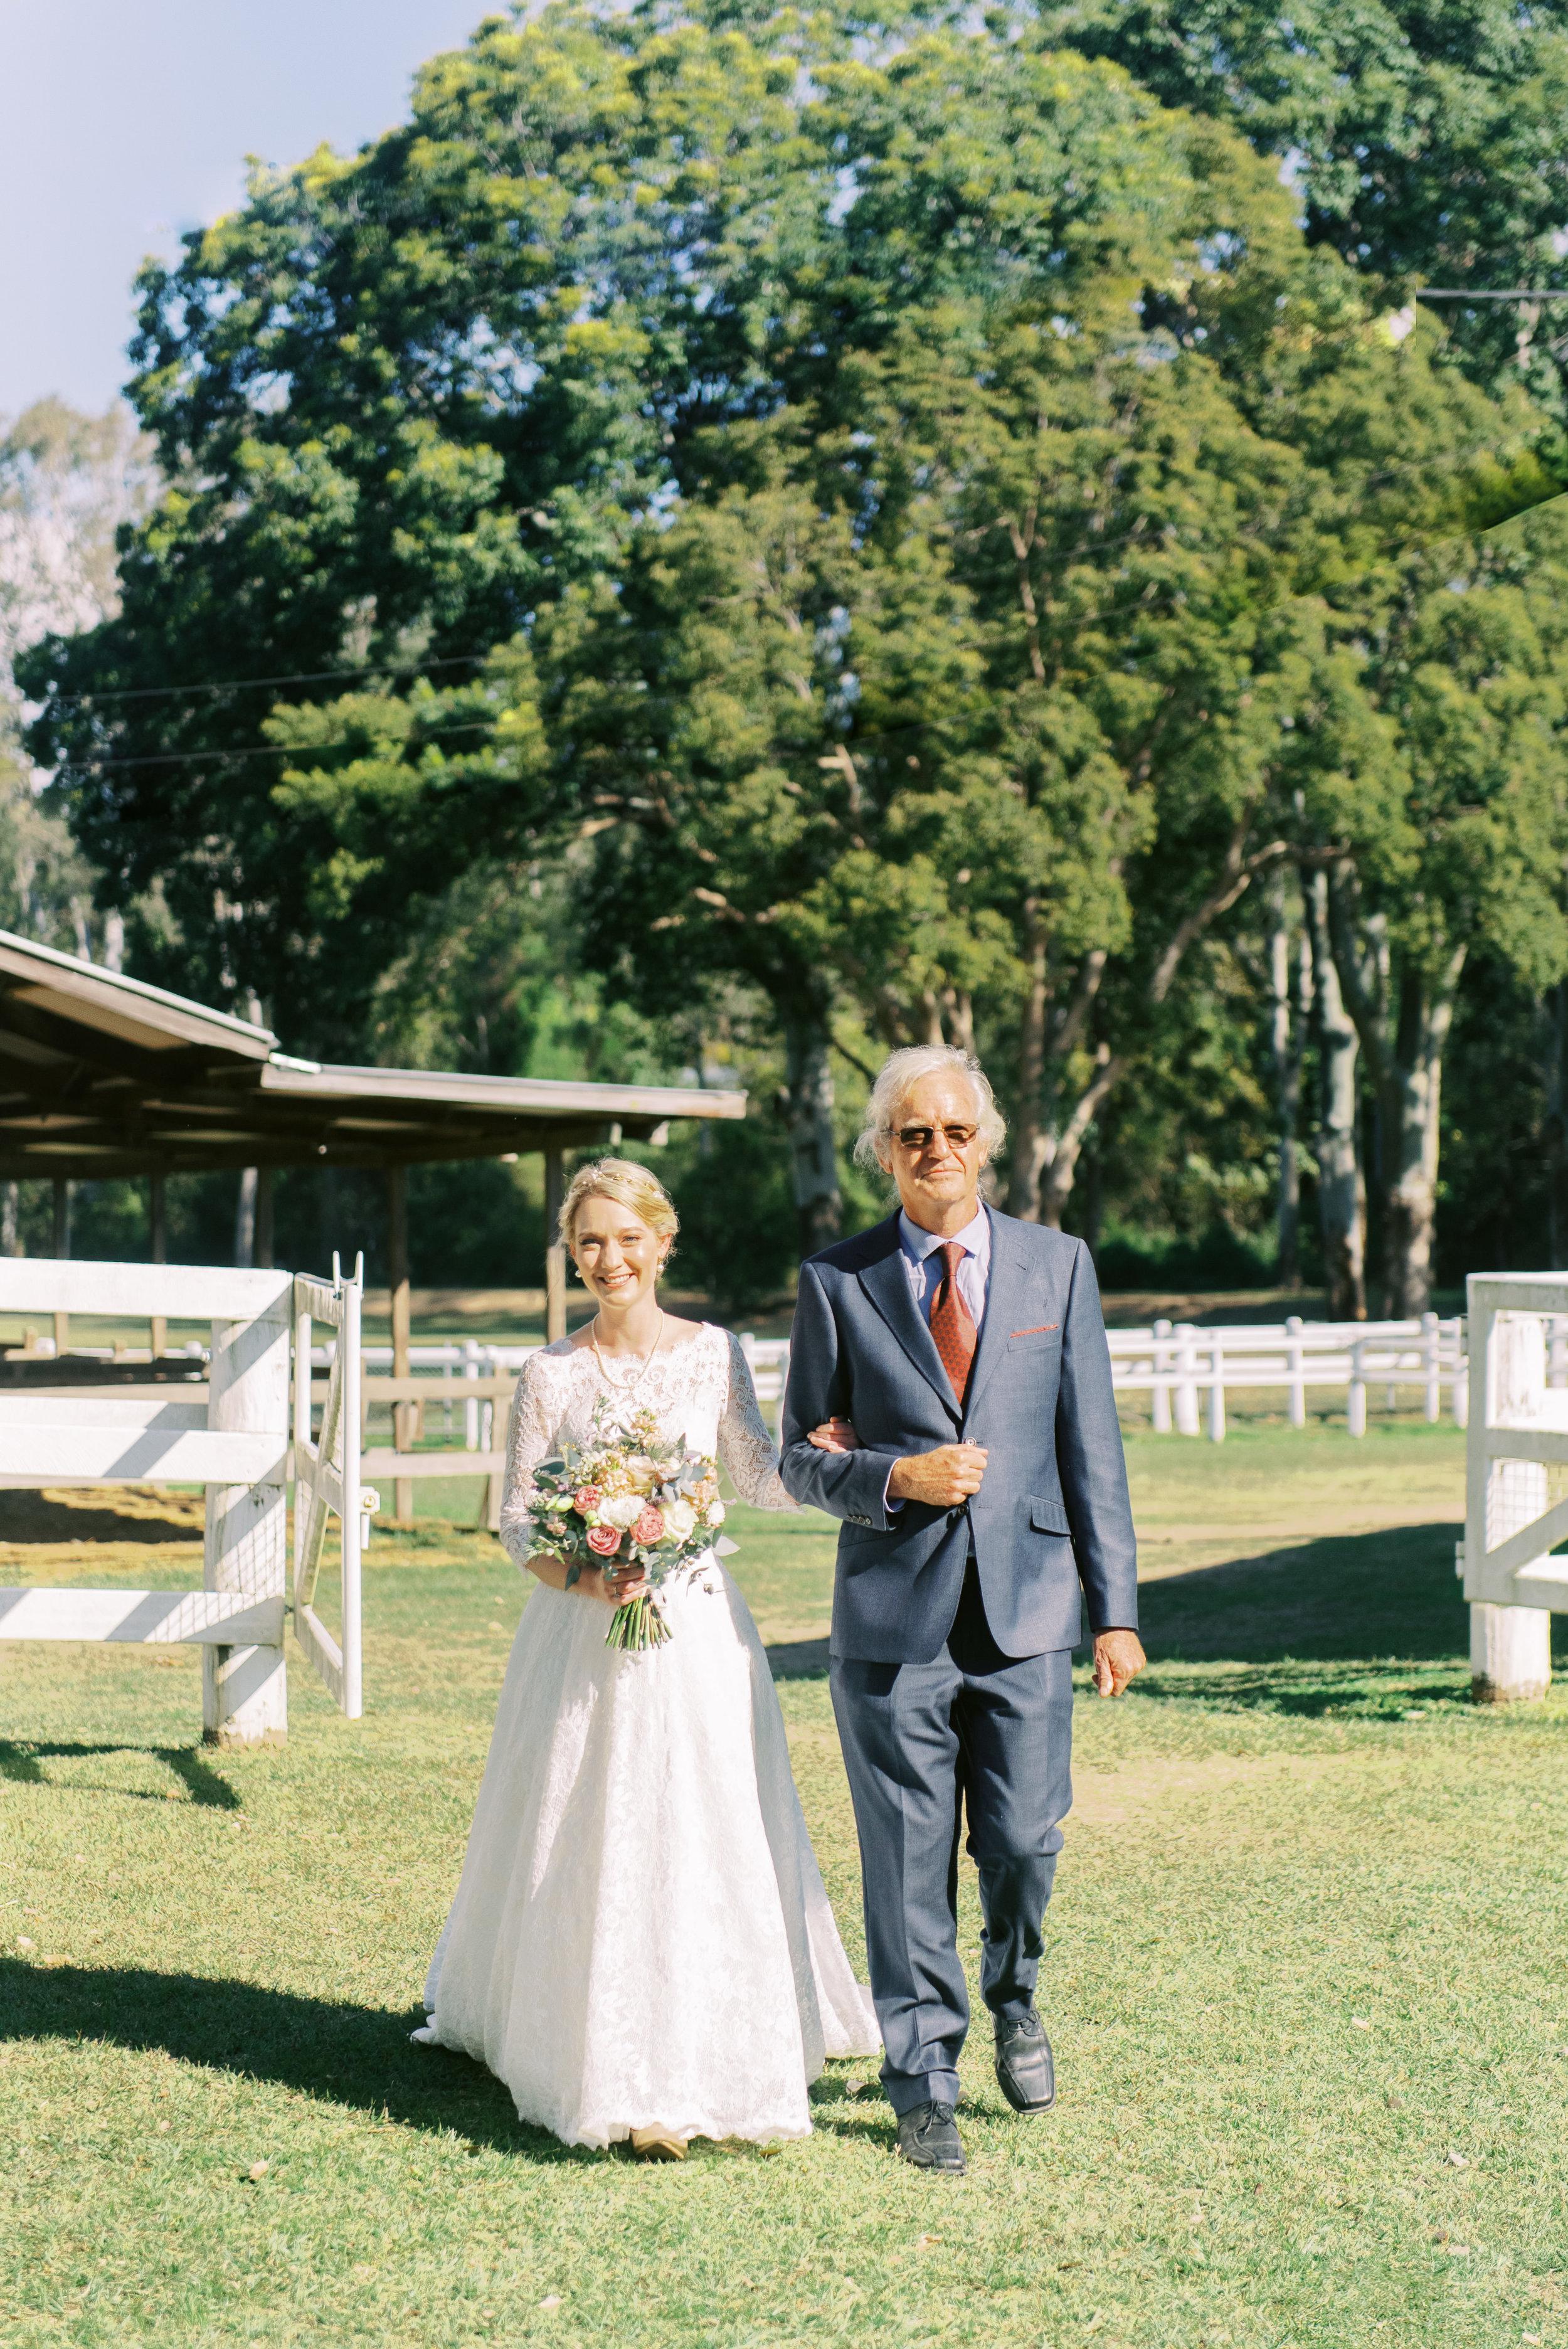 brisbane-gold-coast-sunshine-coast-tweed-romantic-fine-art-wedding-photography-lauren-olivia-22.jpg